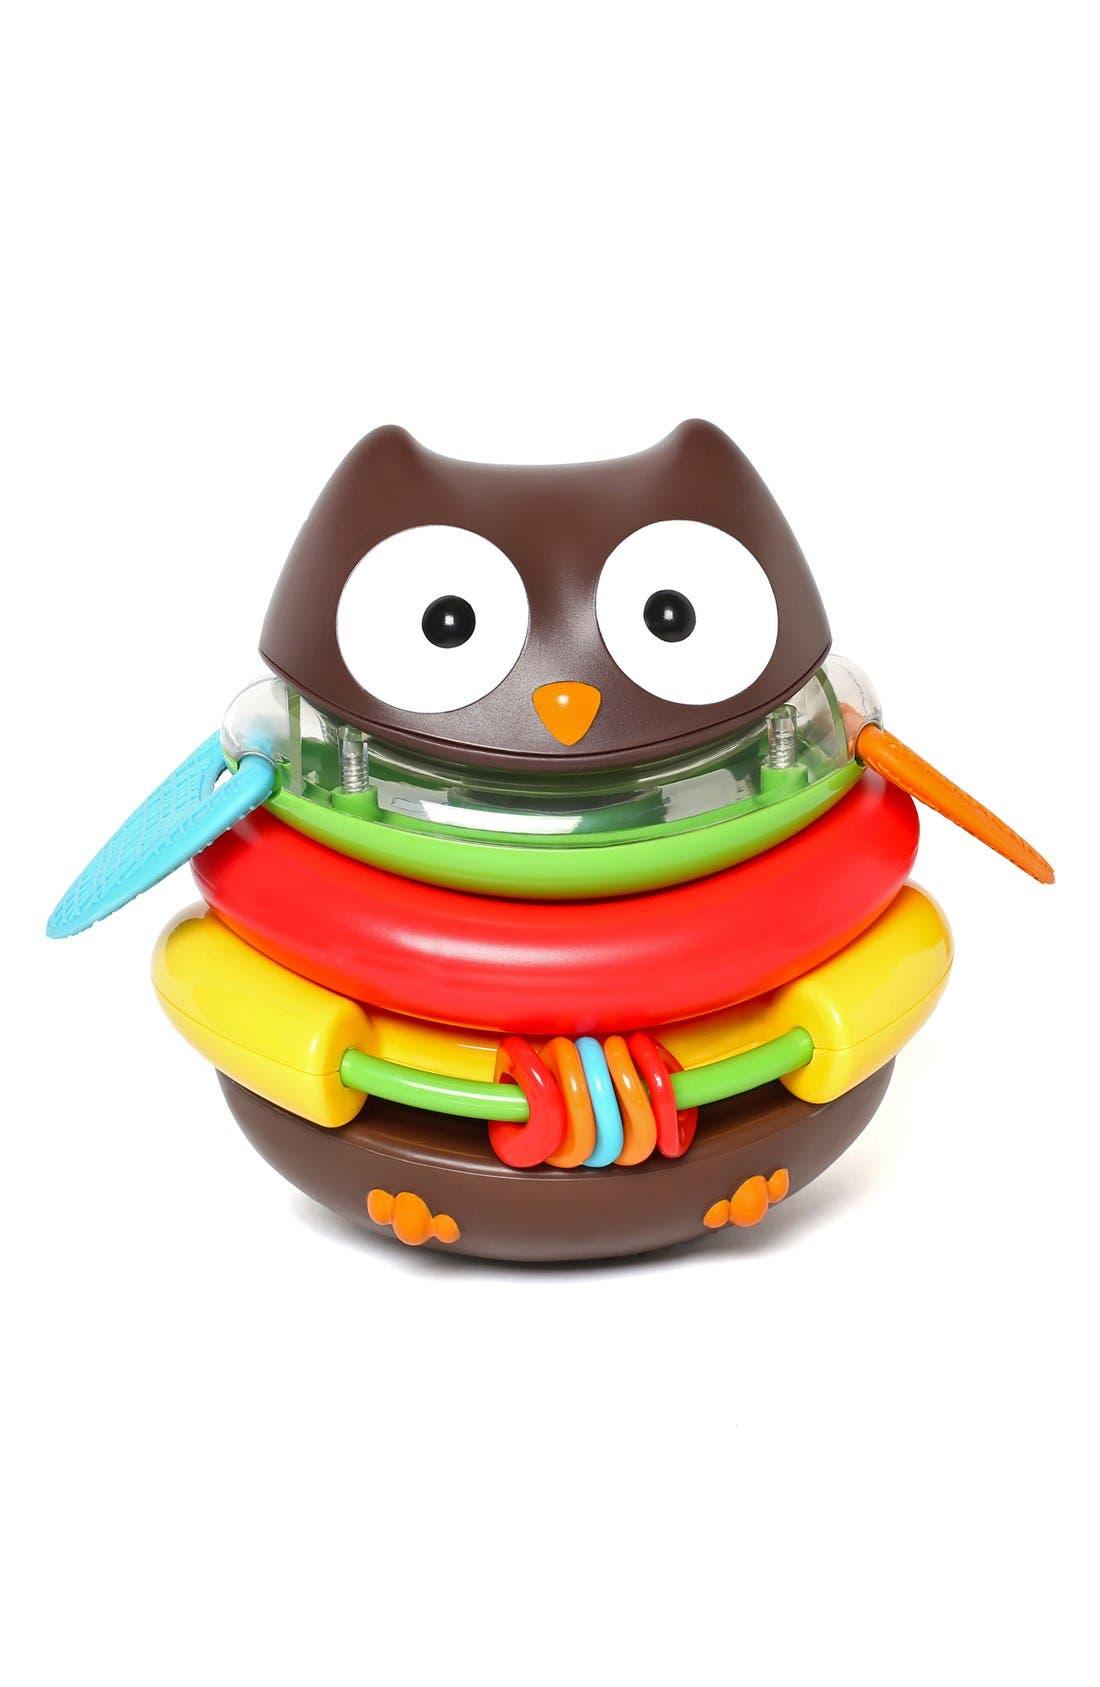 Alternate Image 1 Selected - Skip Hop 'Explore & More' Rocking Owl Stacker